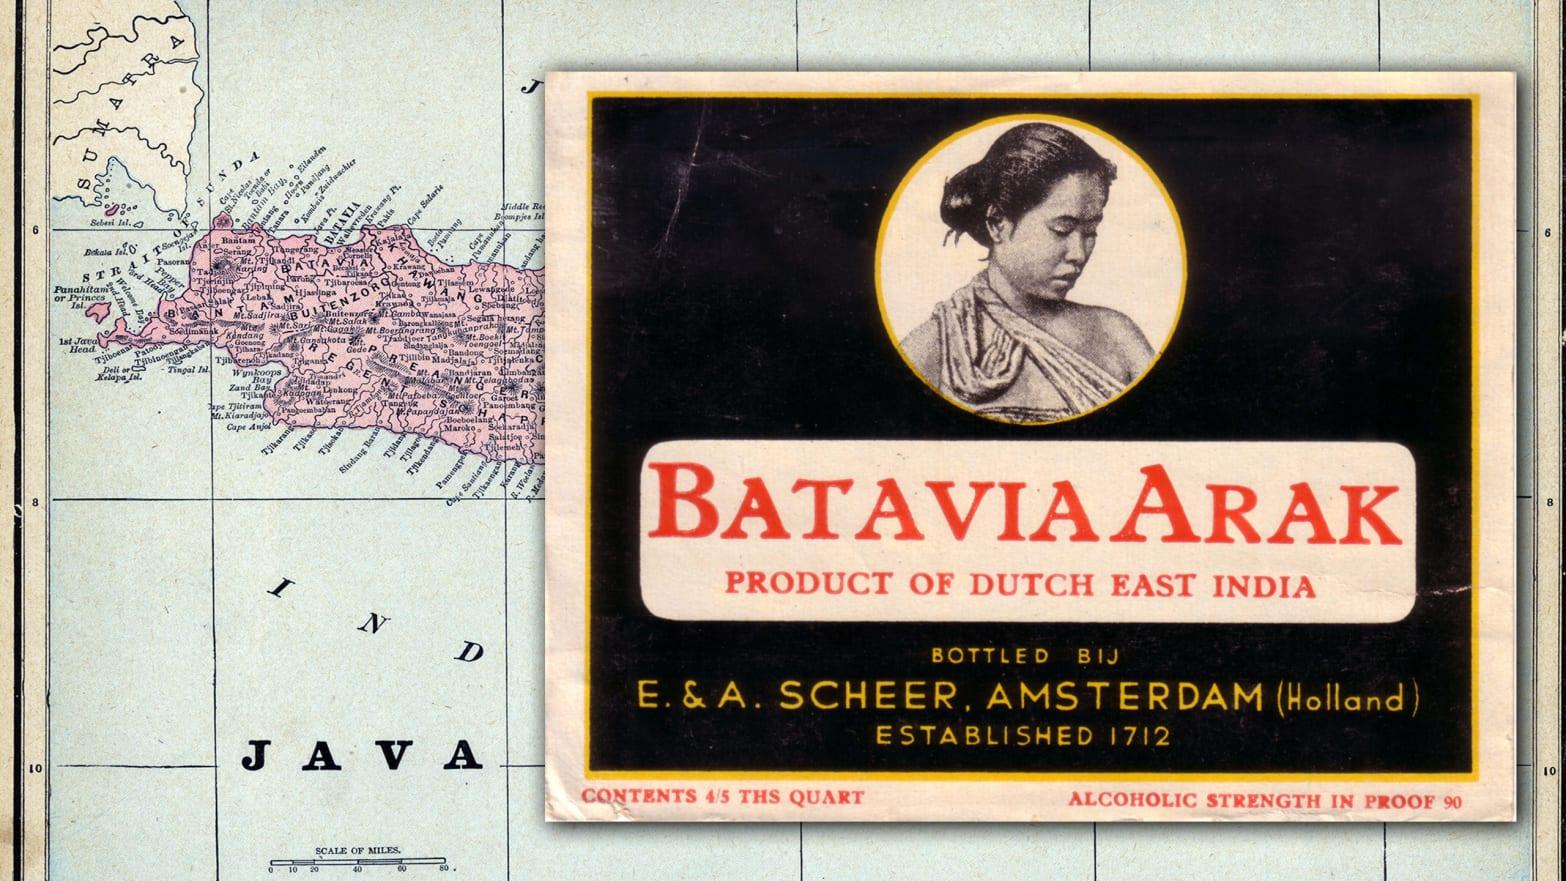 Rediscovering the World's First Luxury Spirit Batavia Arrack